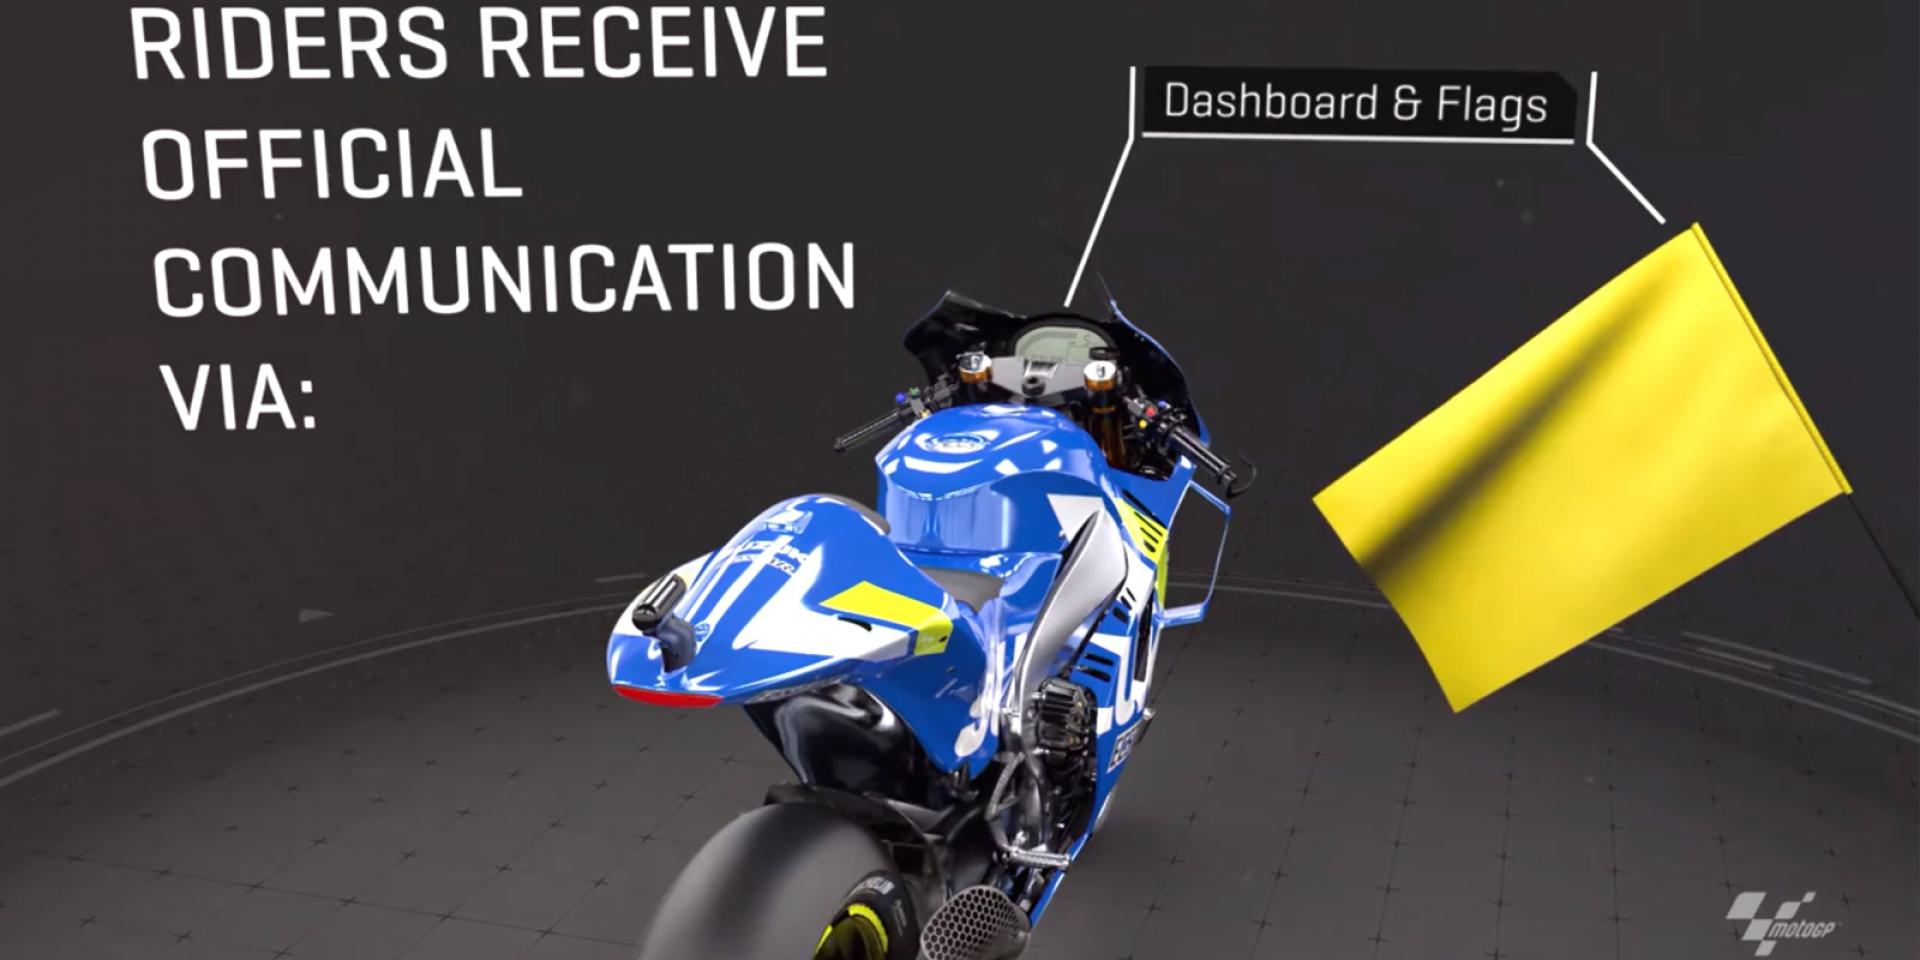 MotoGP賽道講堂|賽道旗號與儀錶訊息